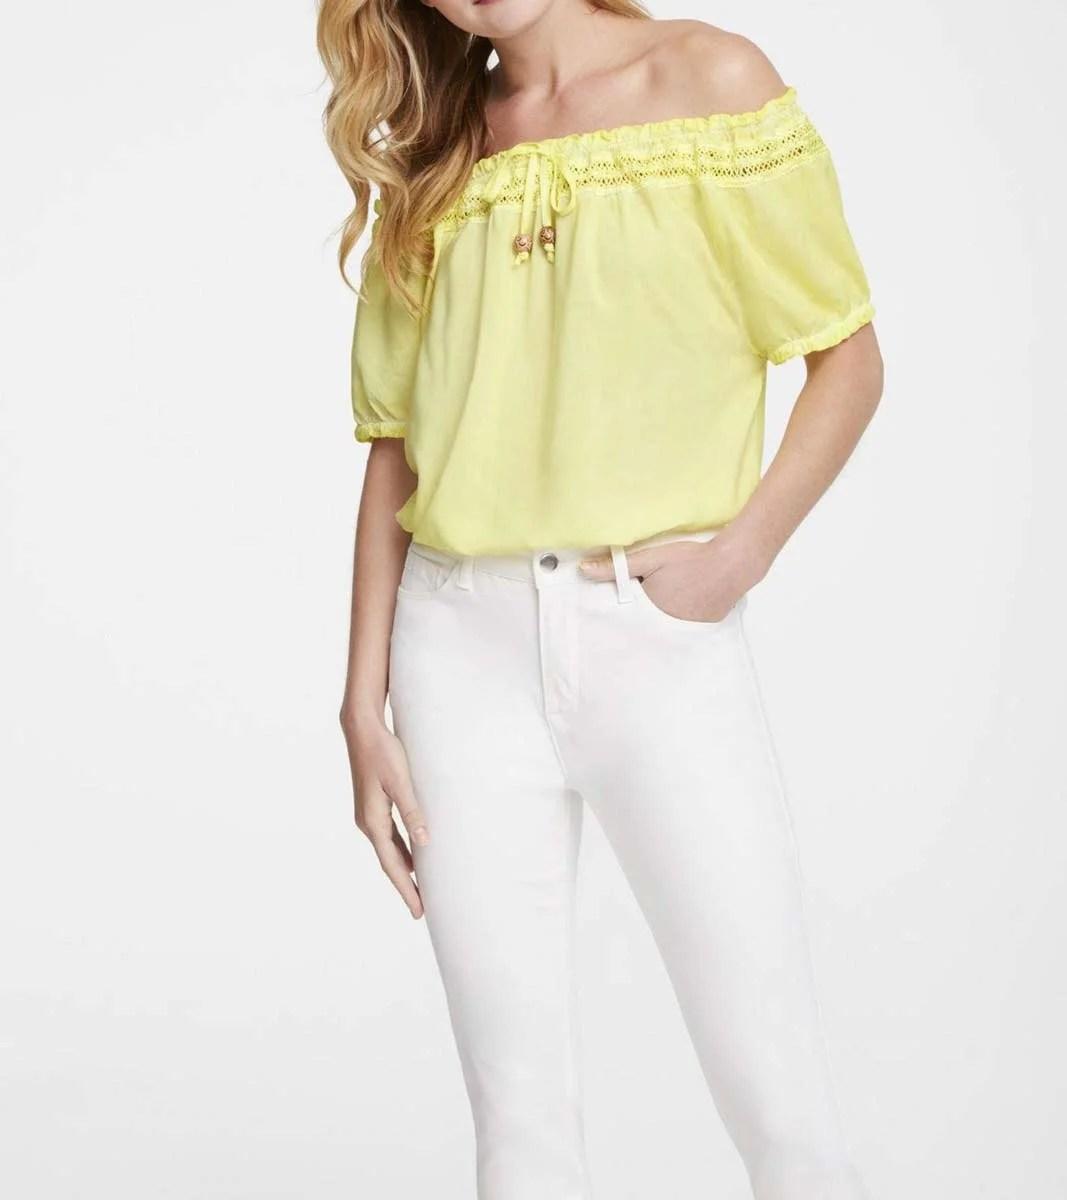 t shirts ohne ärmel Carmenbluse, gelb 301.880 Missforty